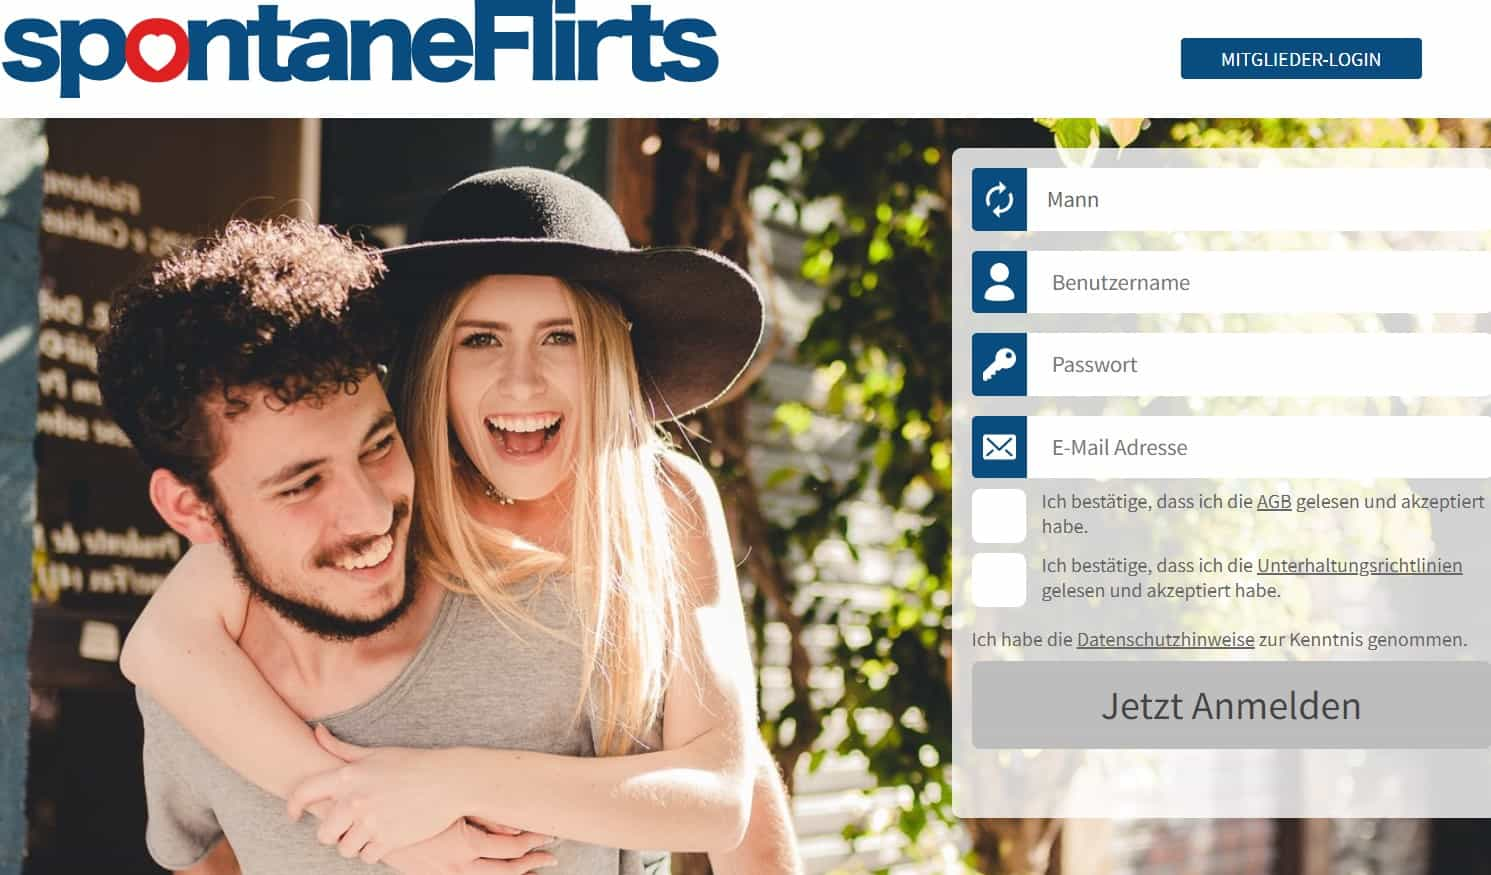 Testbericht: SpontaneFlirts.com Abzocke